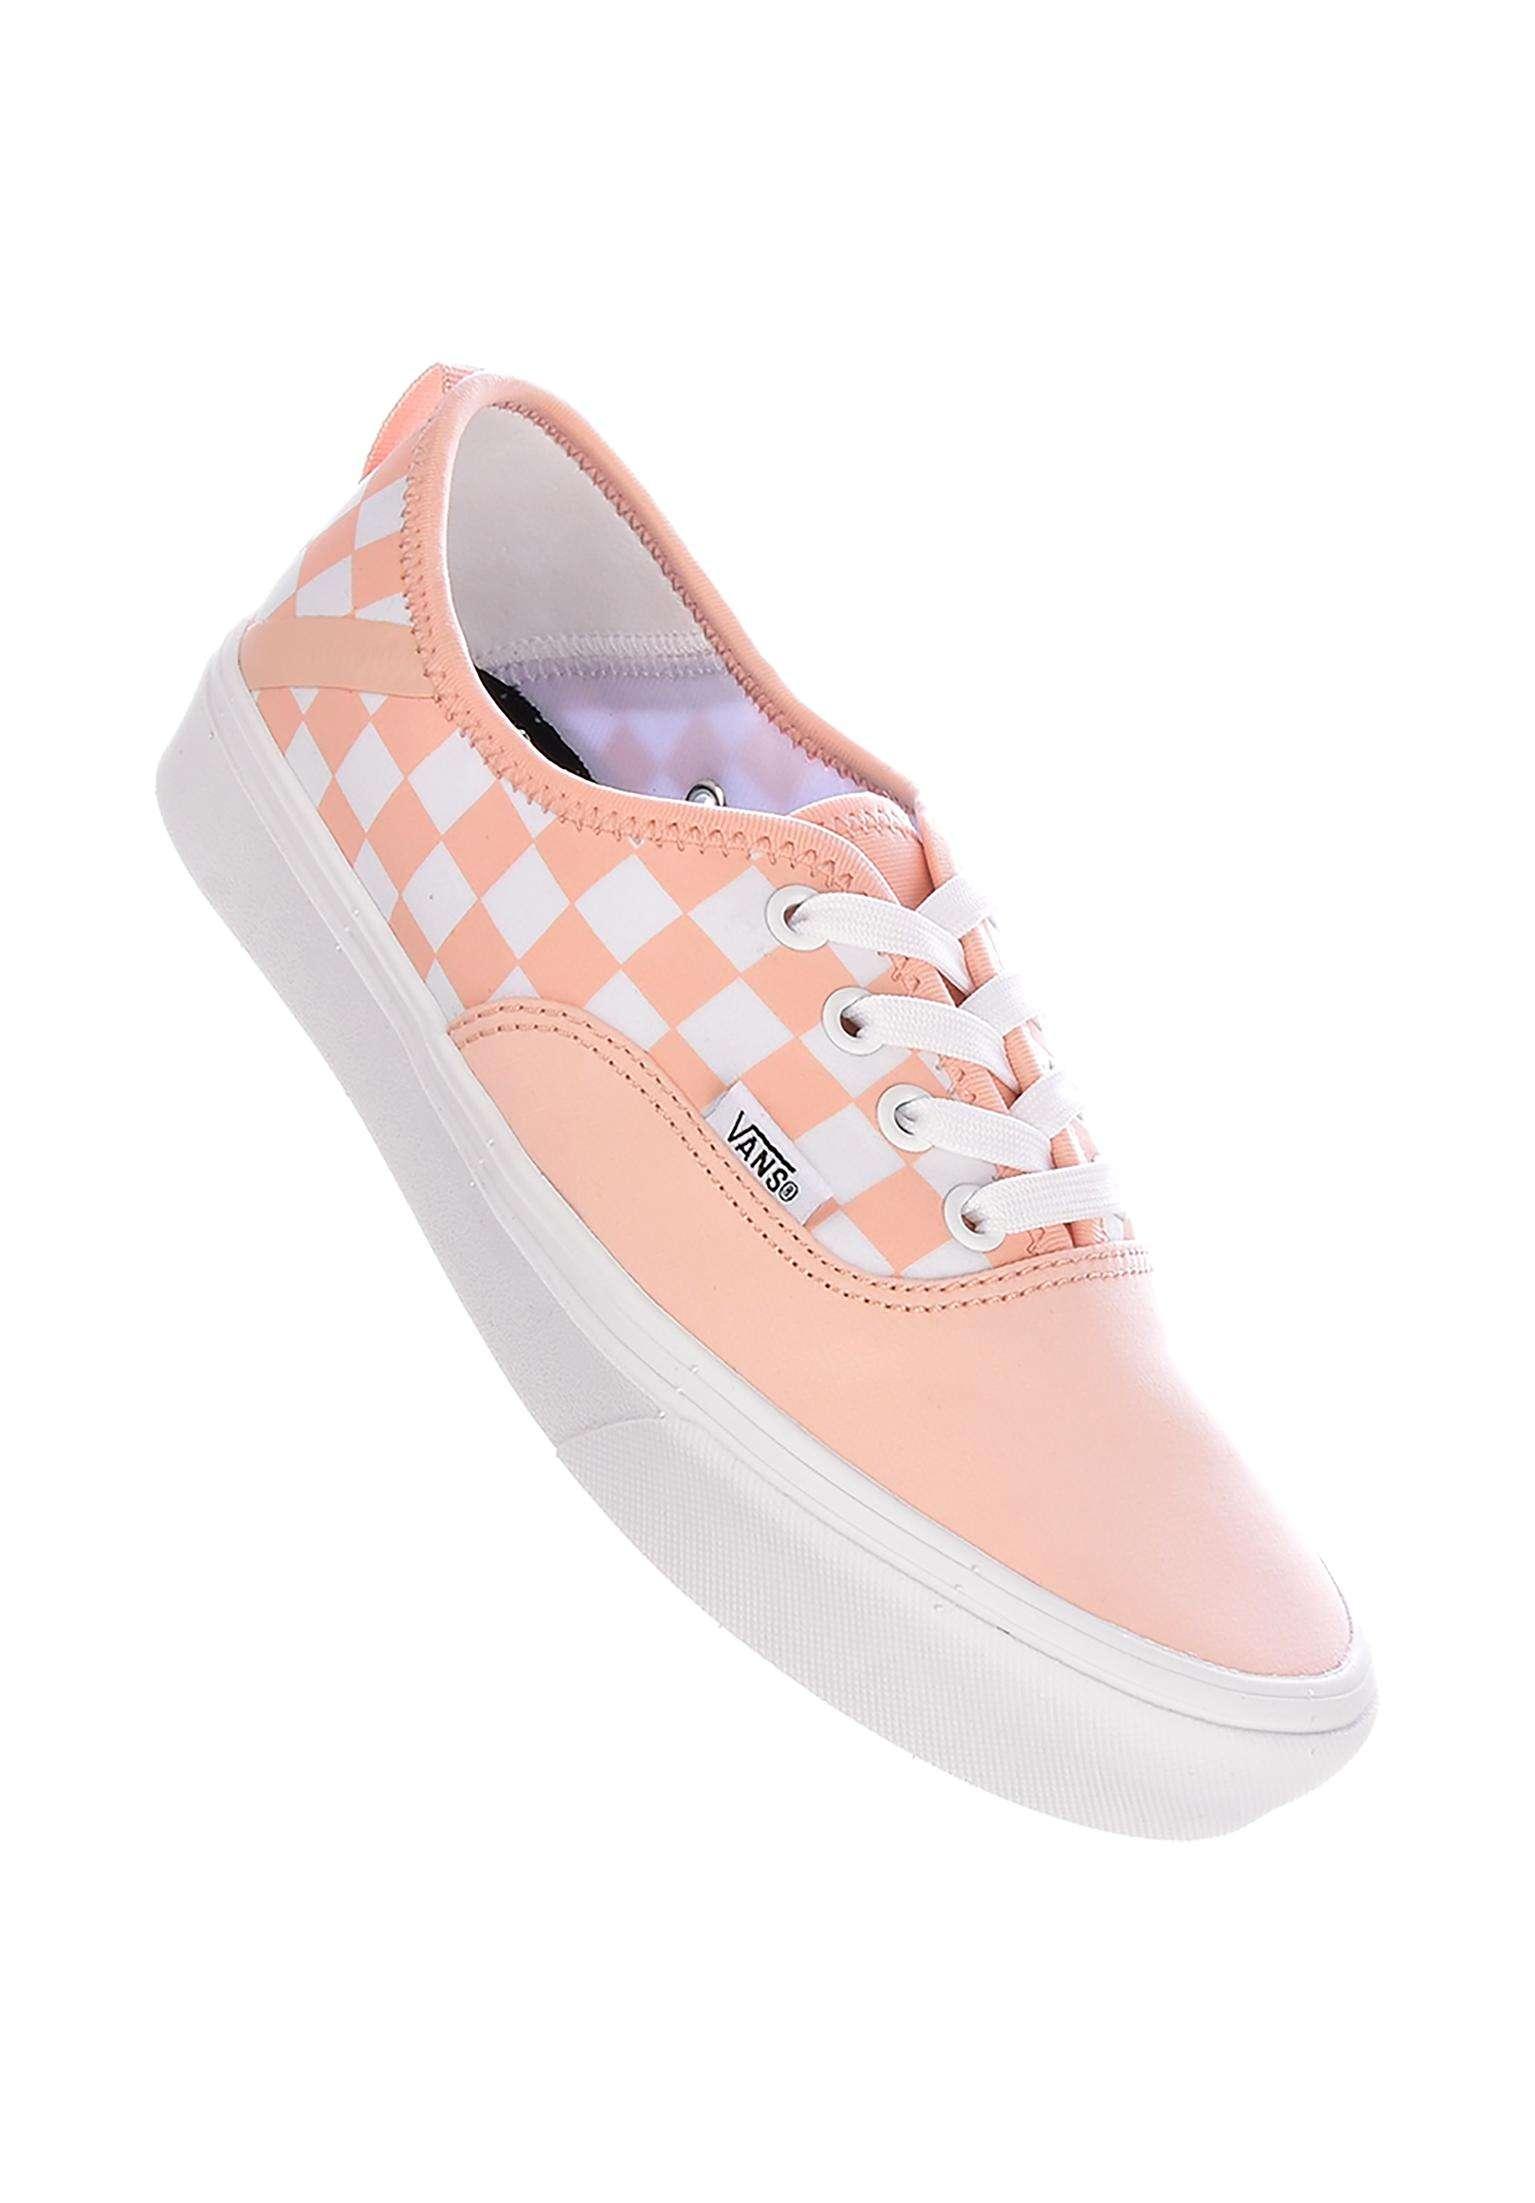 dd6ace38cb3470 Authentic Comfy Cush Vans Alle Schoenen in checkerboard spanish-villawhite  voor Dames